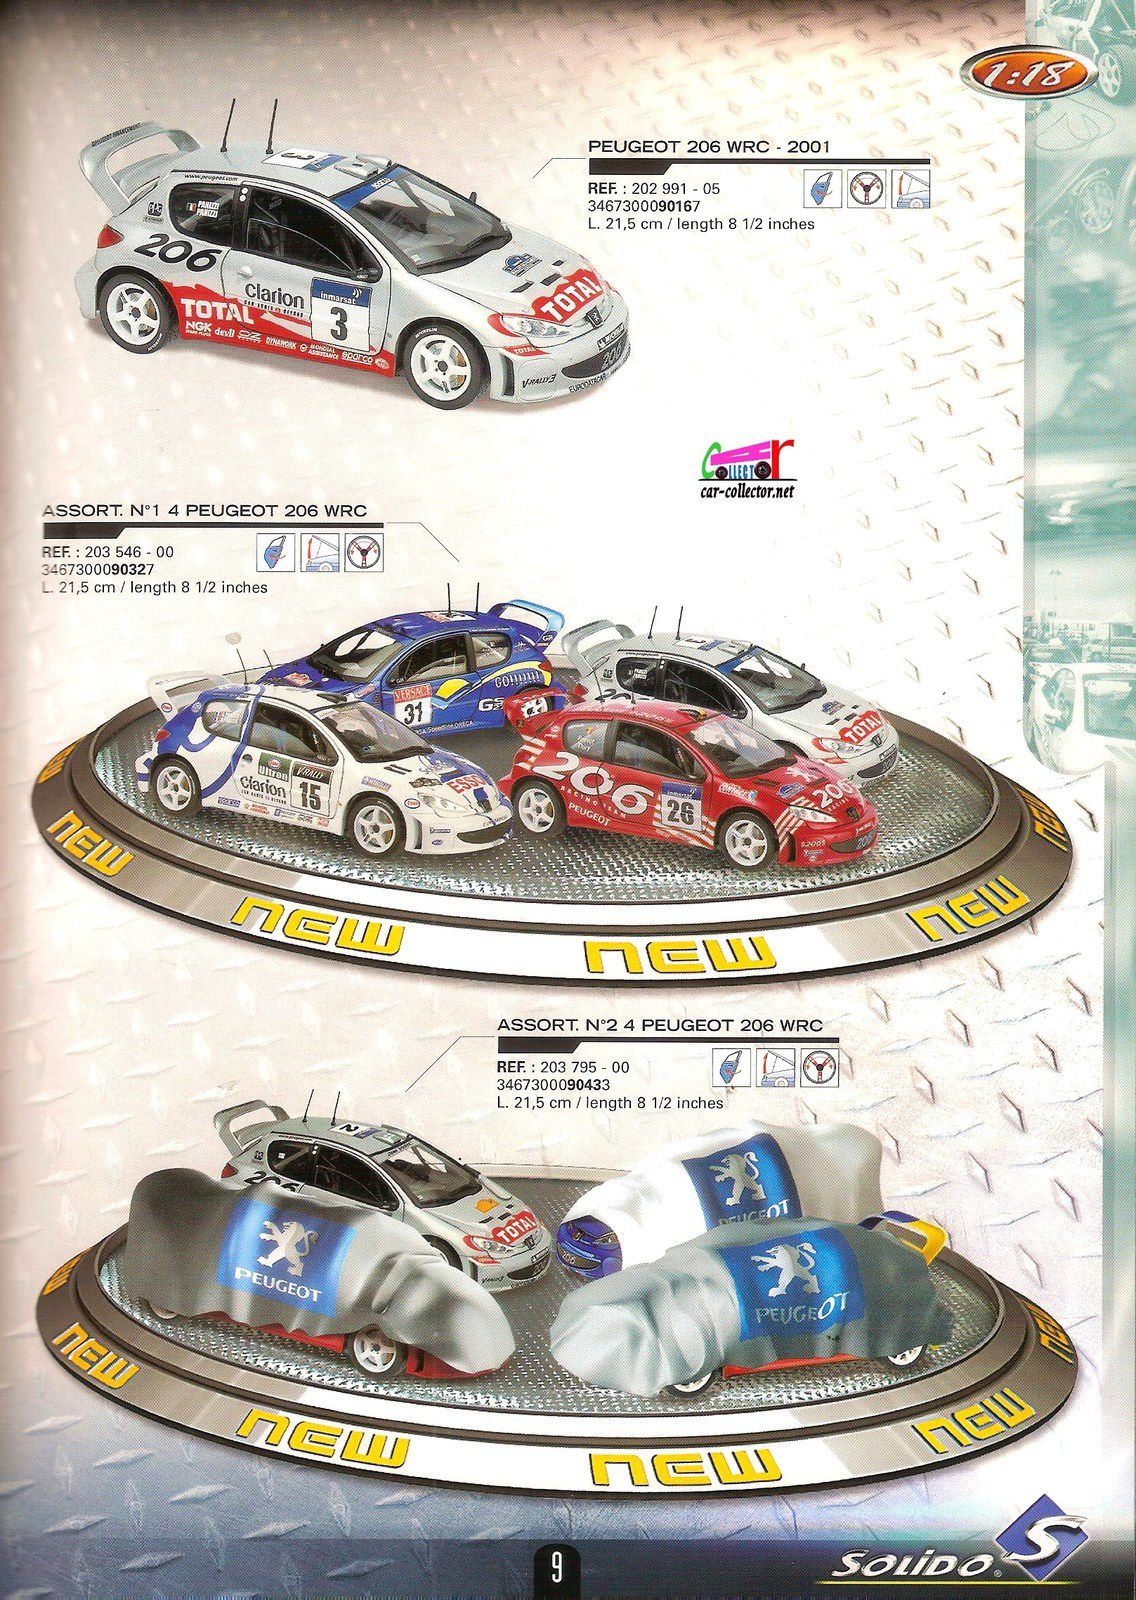 CATALOGUE SOLIDO 2003